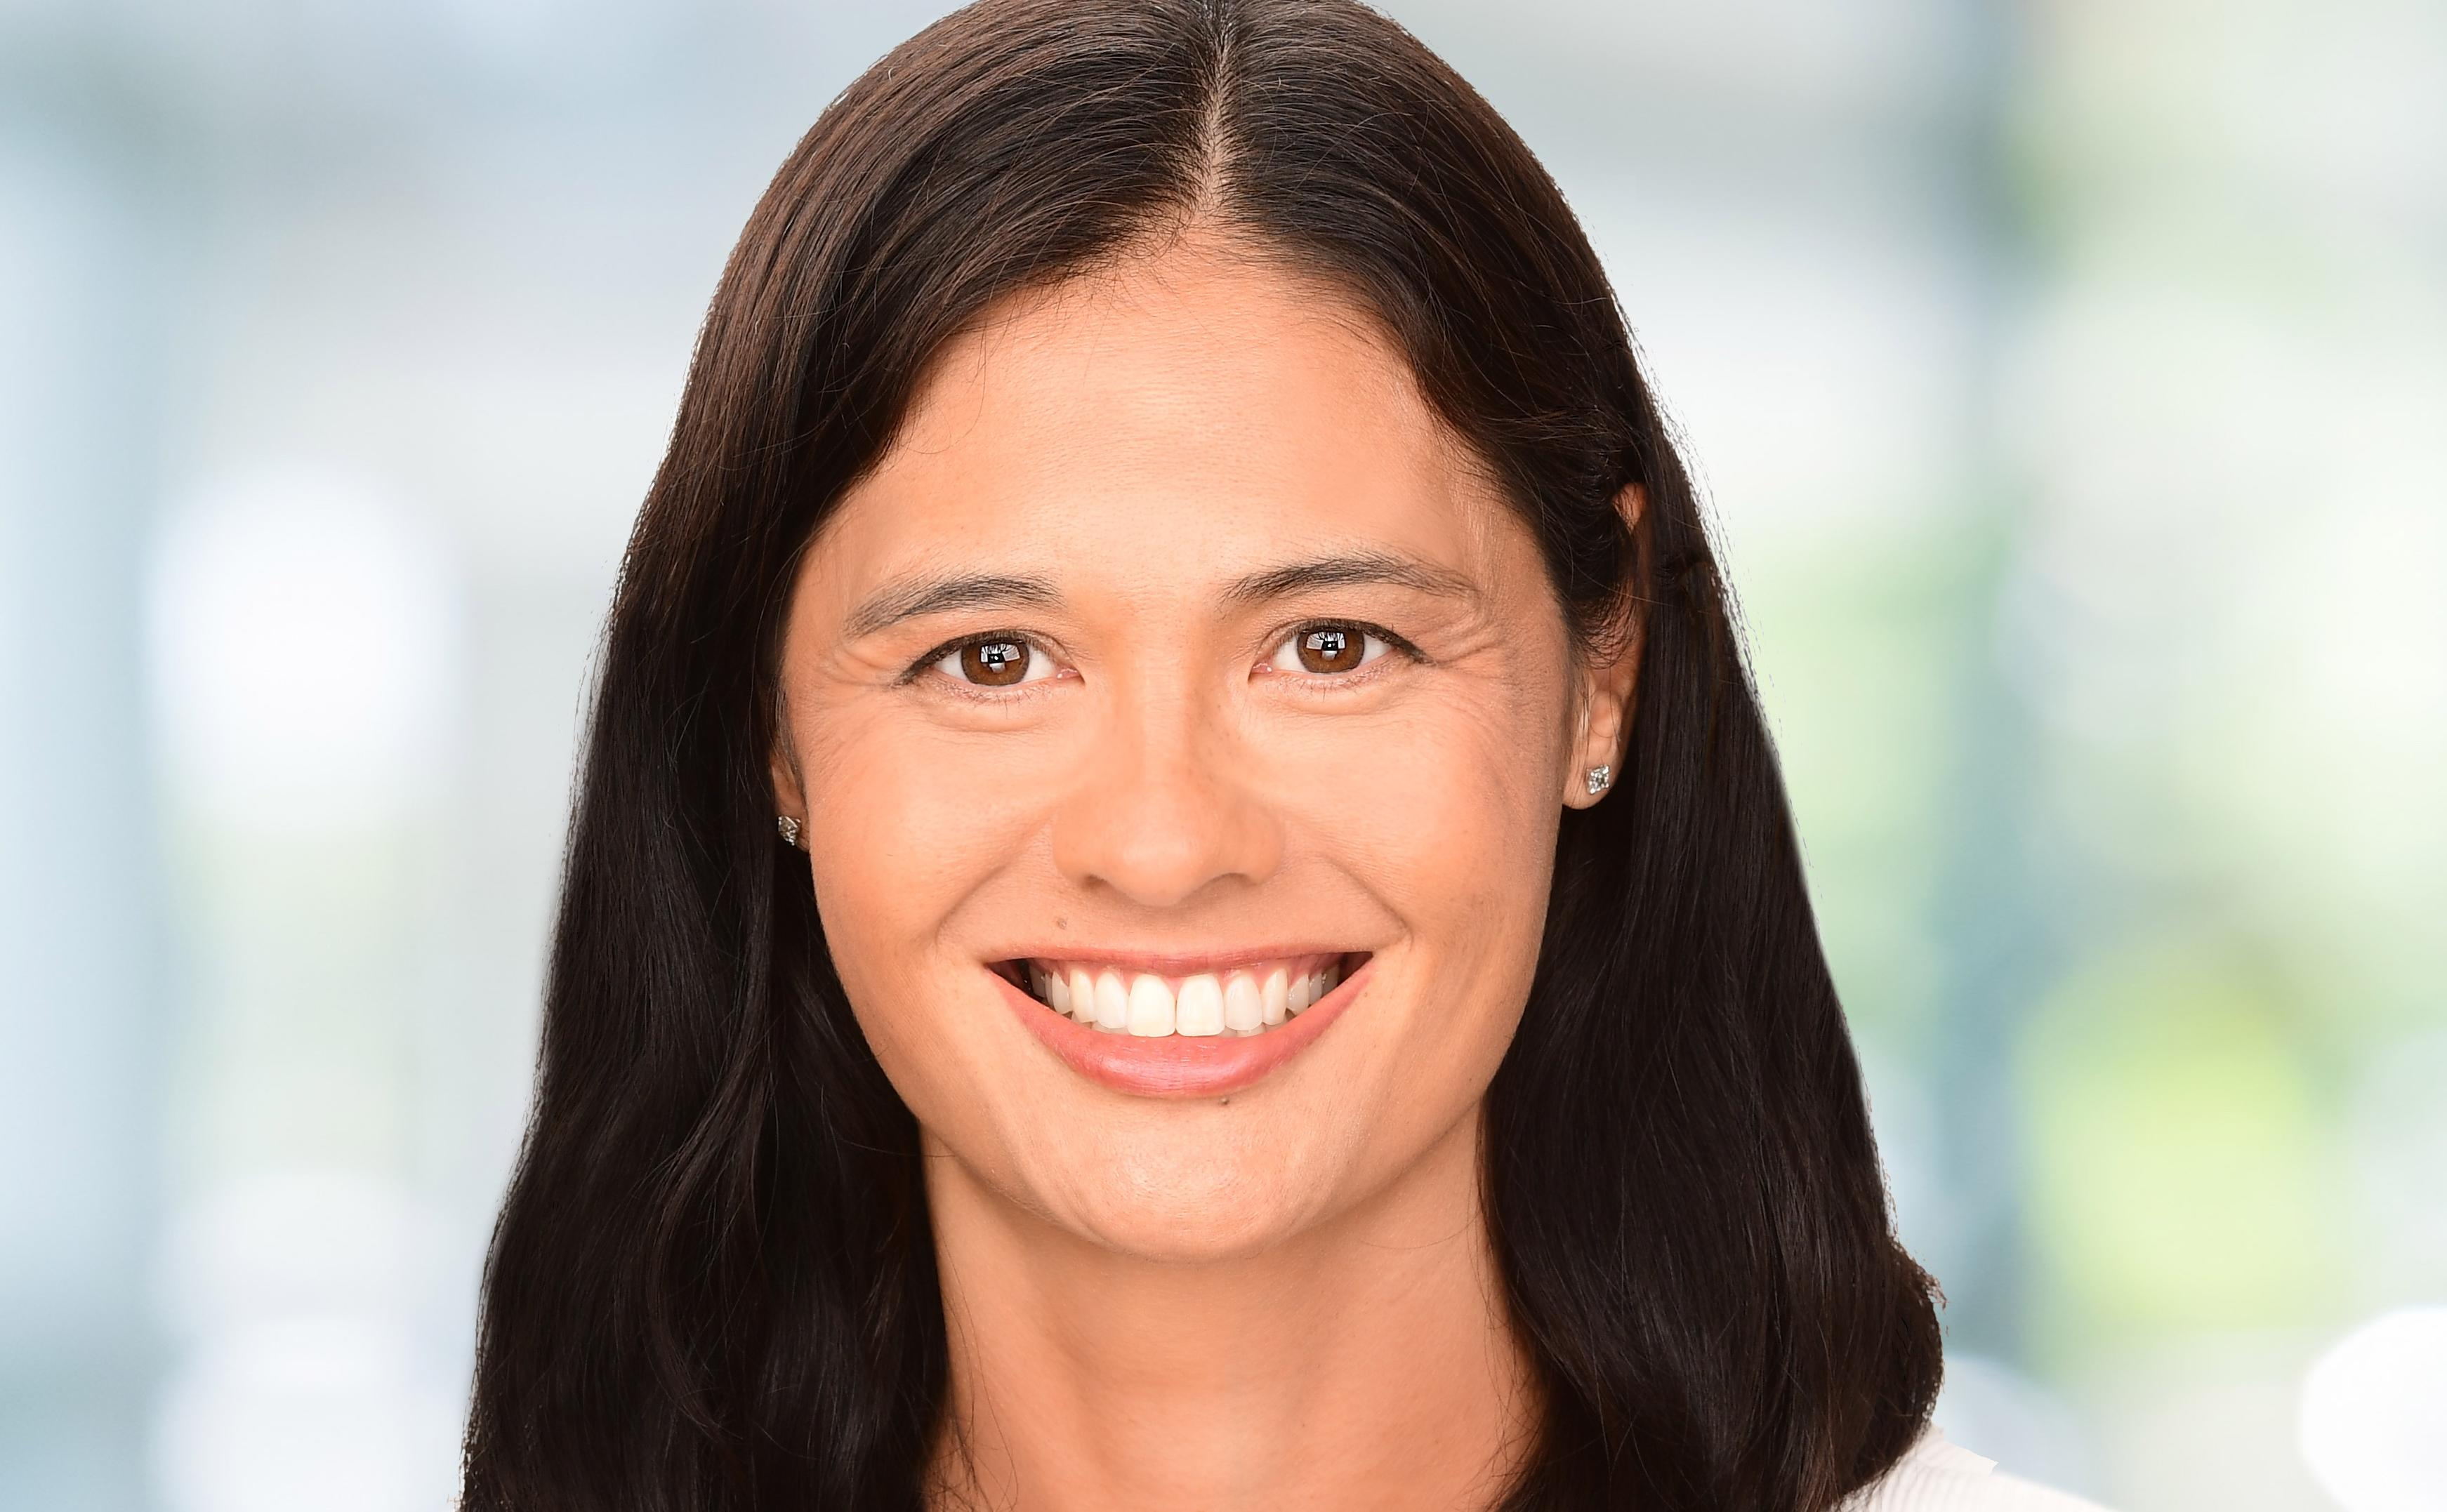 Aussie real estate fintech taps ex-Deloitte partner as new CEO